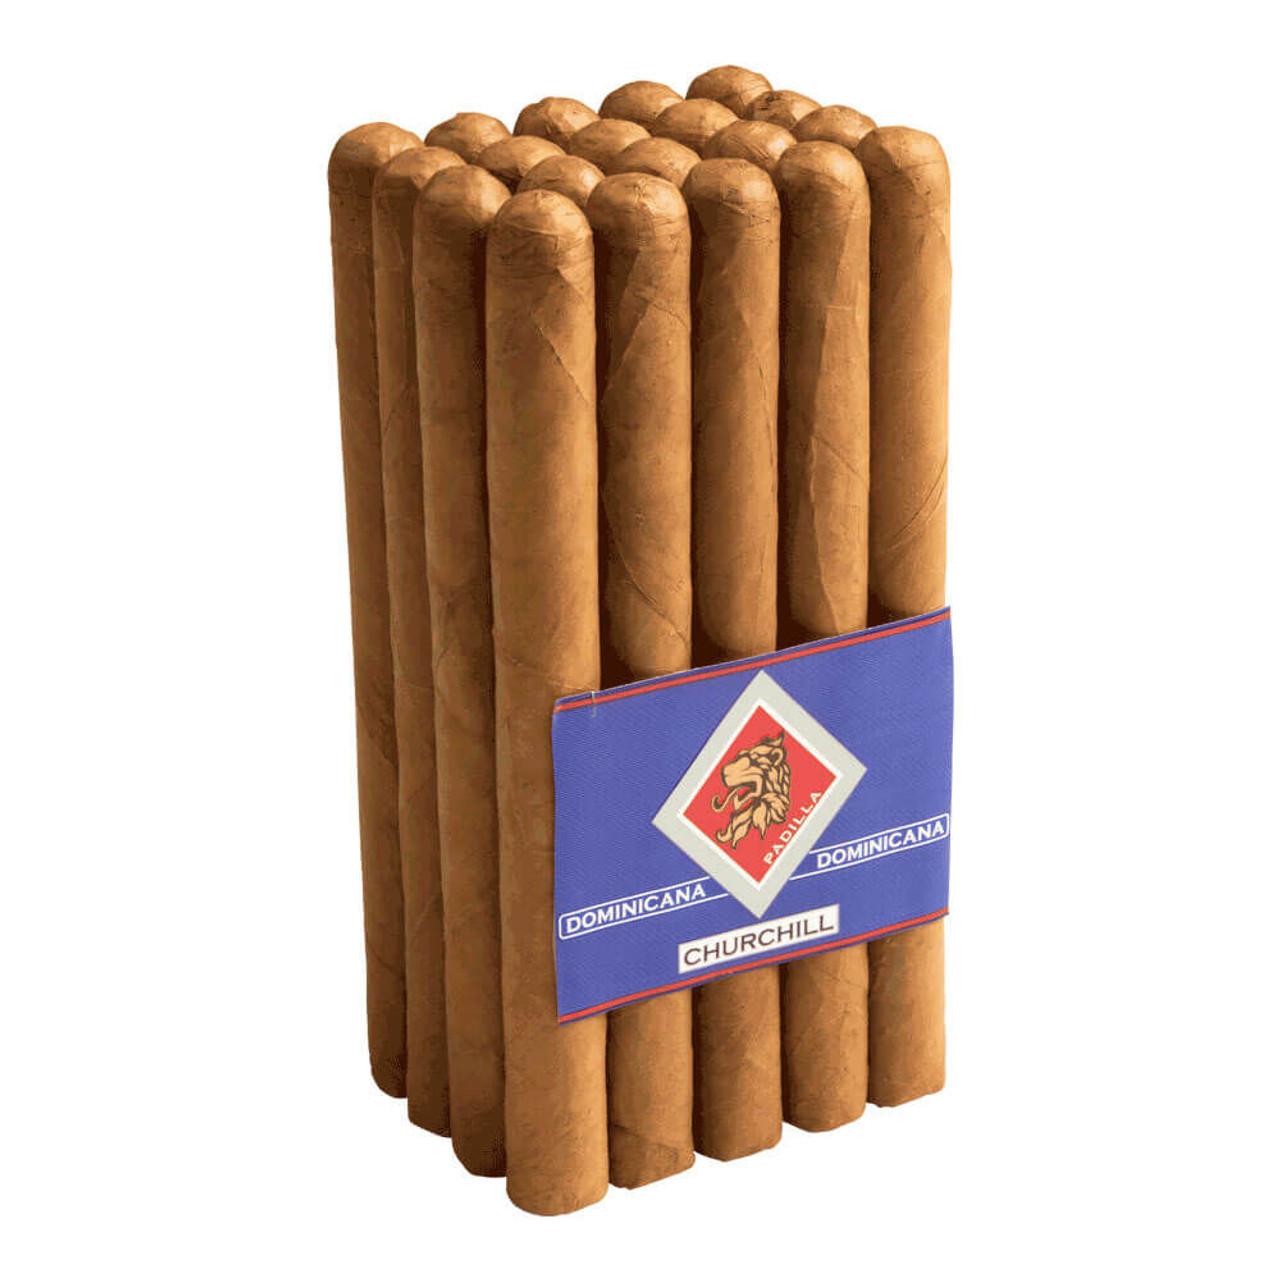 Padilla Dominicana Churchill Cigars - 7.5 x 50 (Bundle of 20)